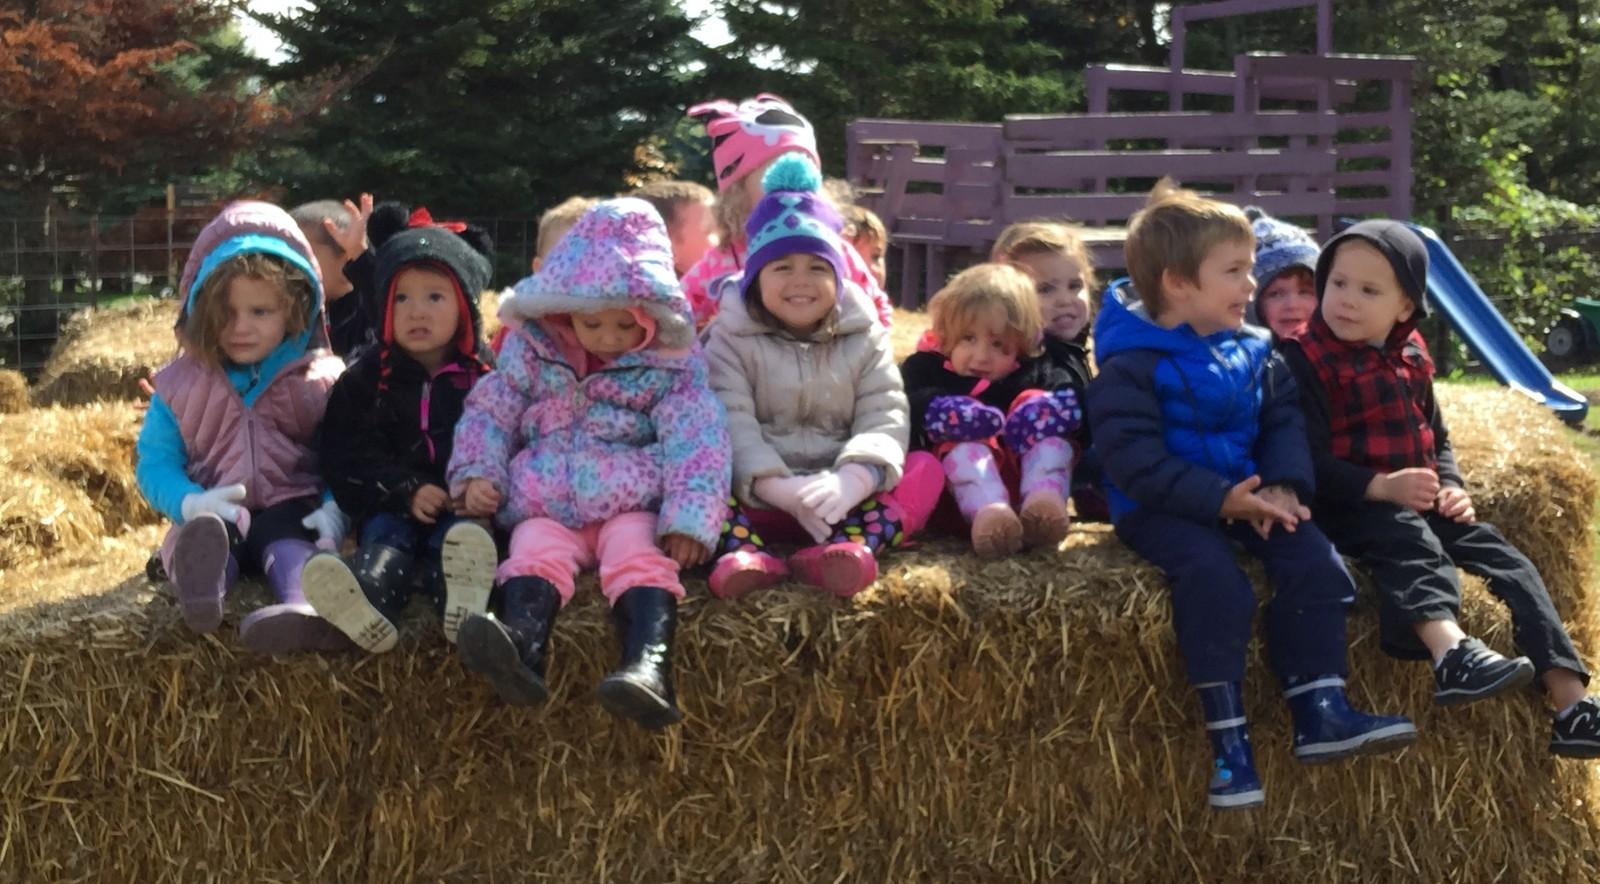 Kids can take a wagon ride, visit farm animals and pick their own pumpkins at Becker Farms.